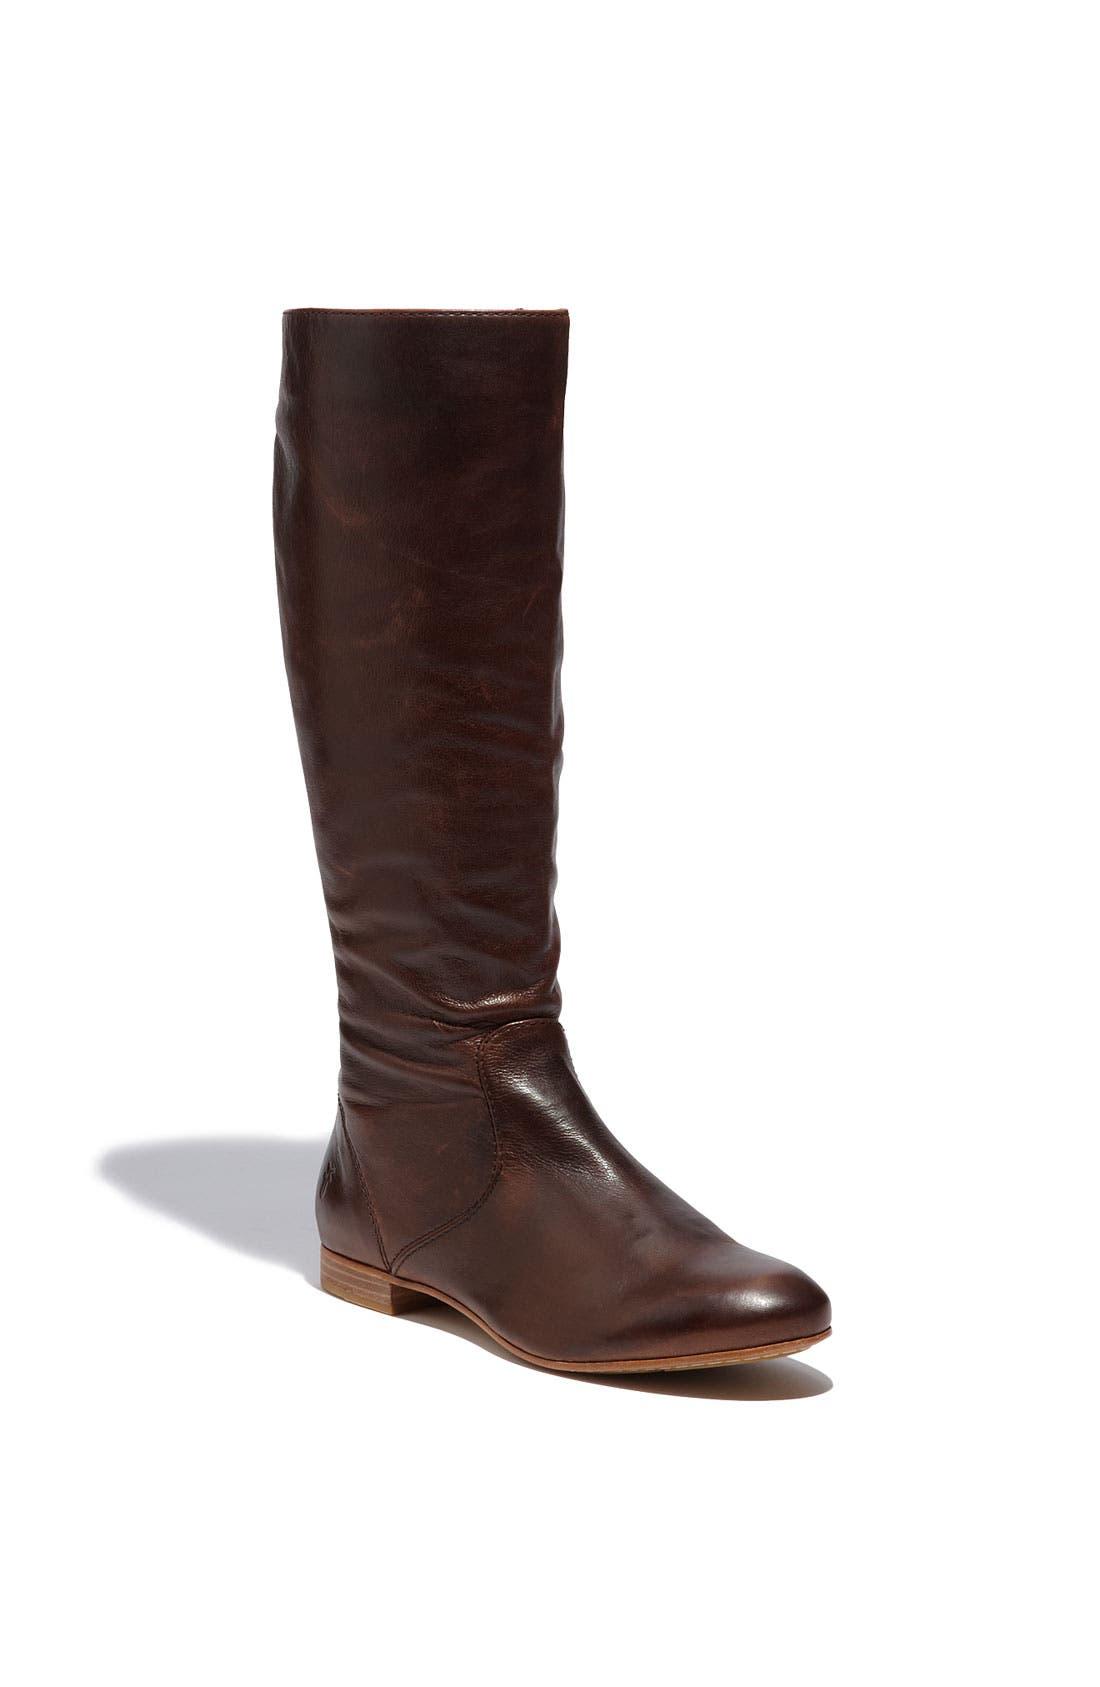 Main Image - Frye 'Jillian' Boot